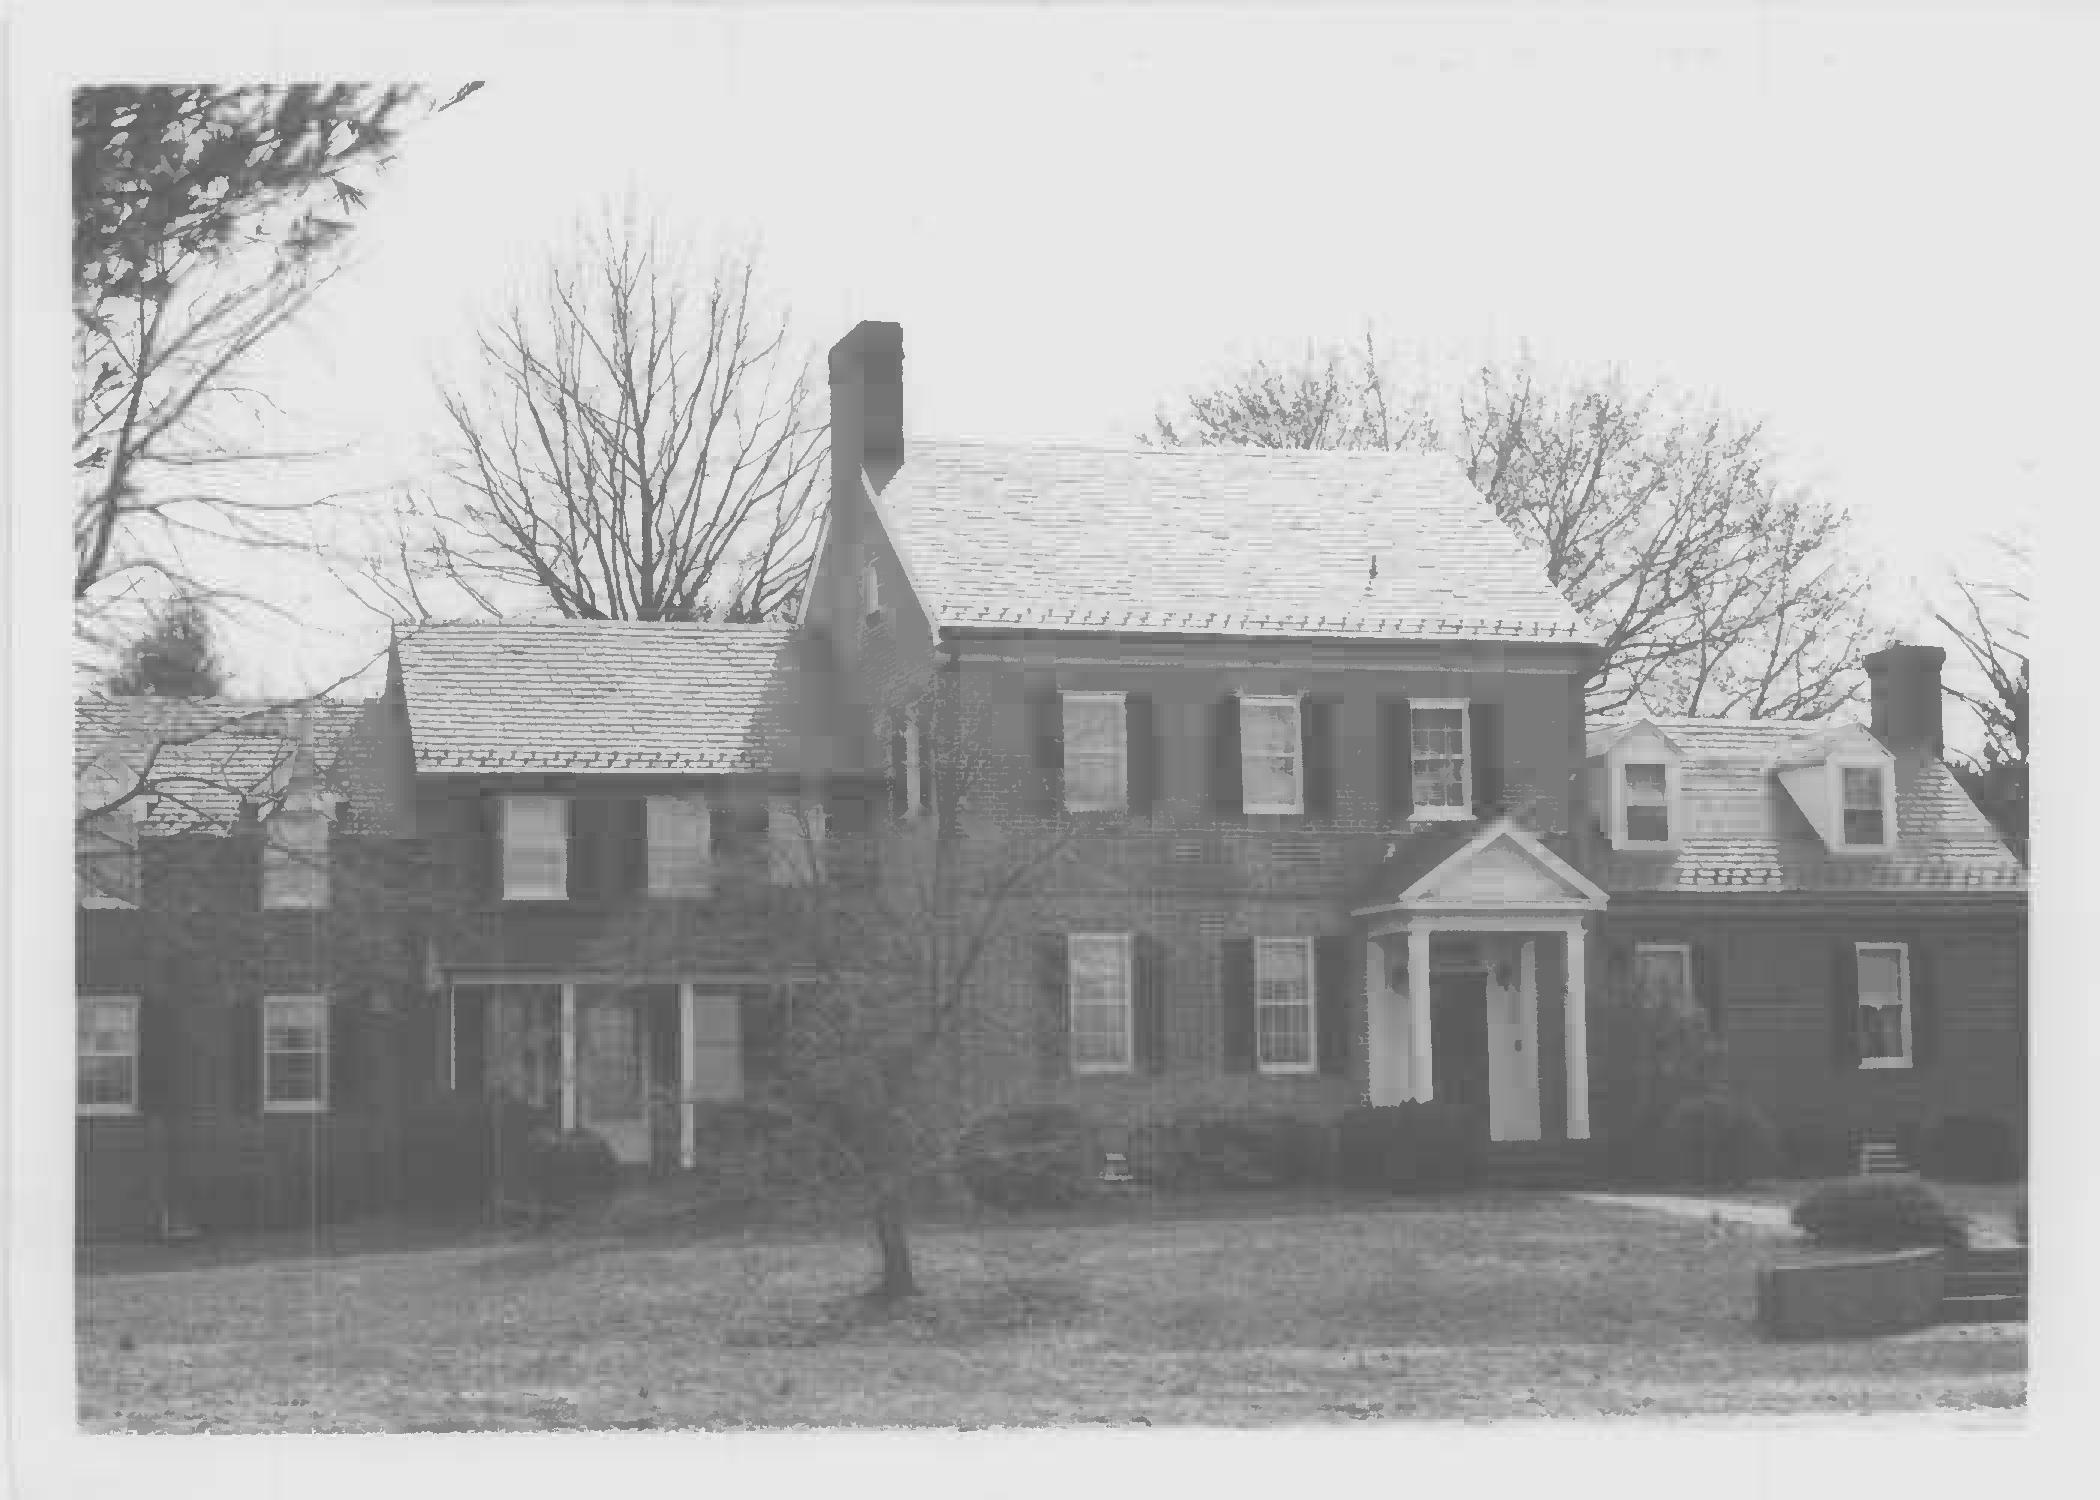 North elevation of Whites Hall